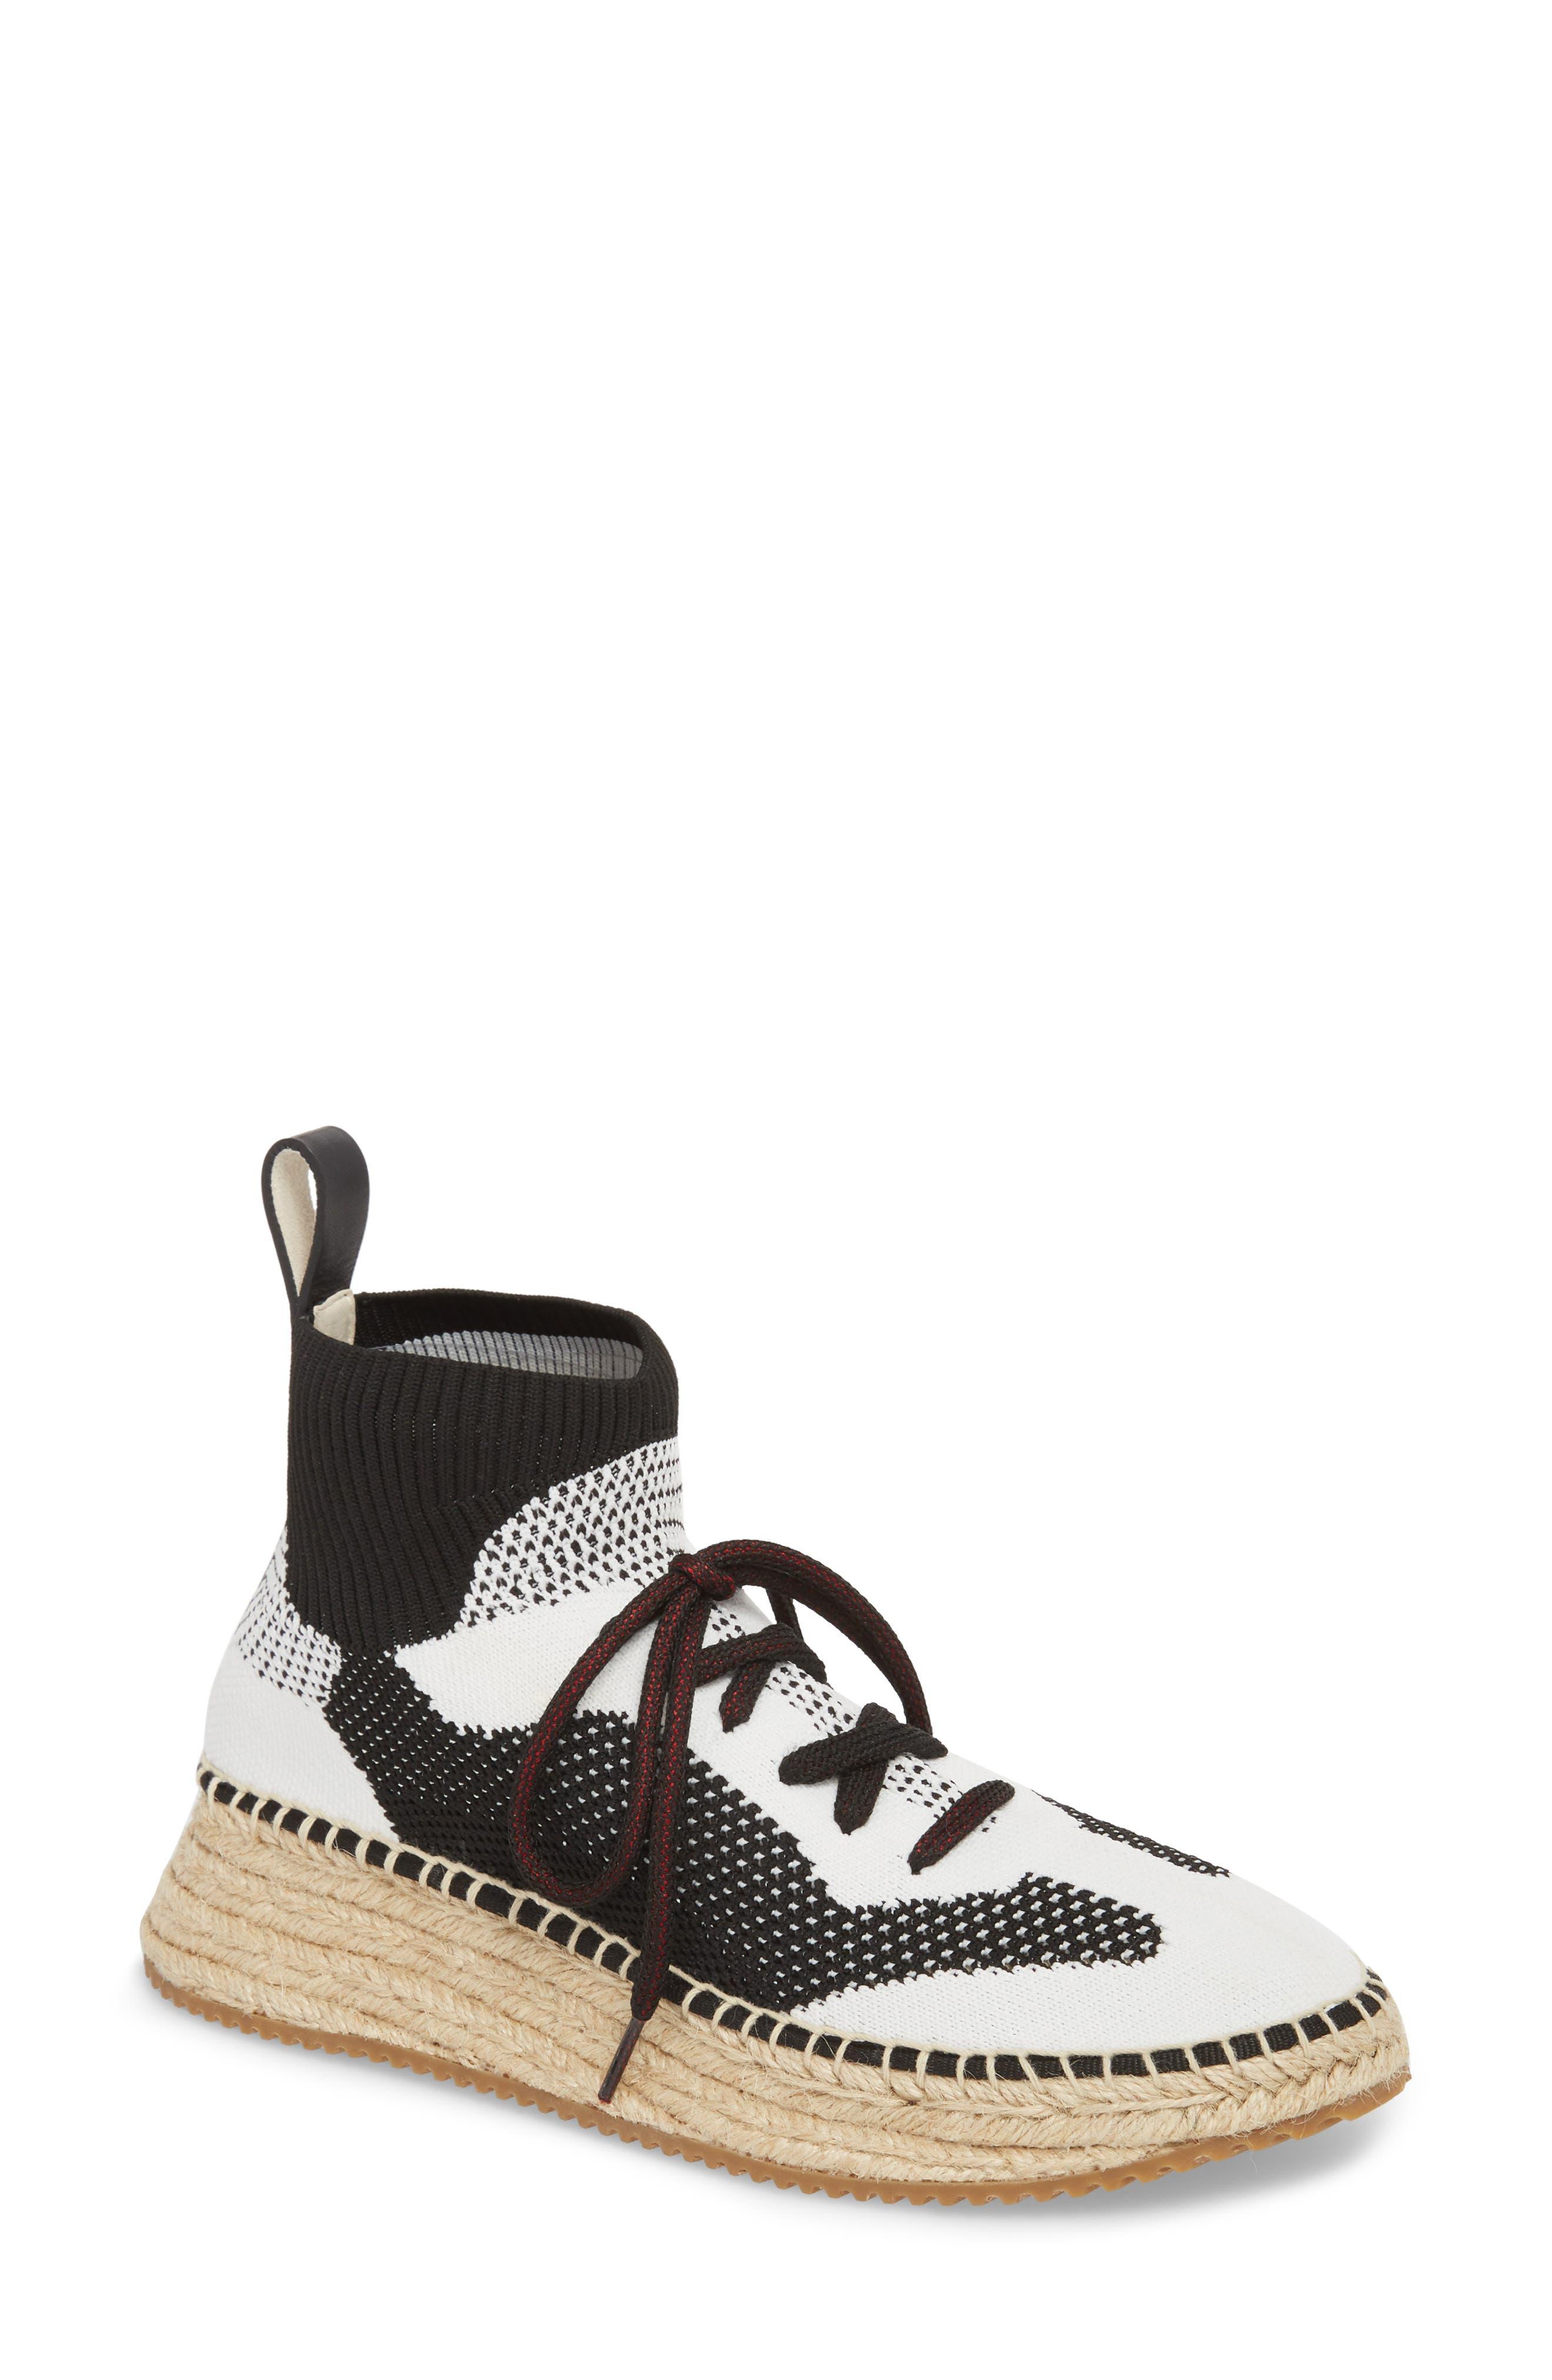 Dakota Espadrille Sock Sneaker,                             Main thumbnail 1, color,